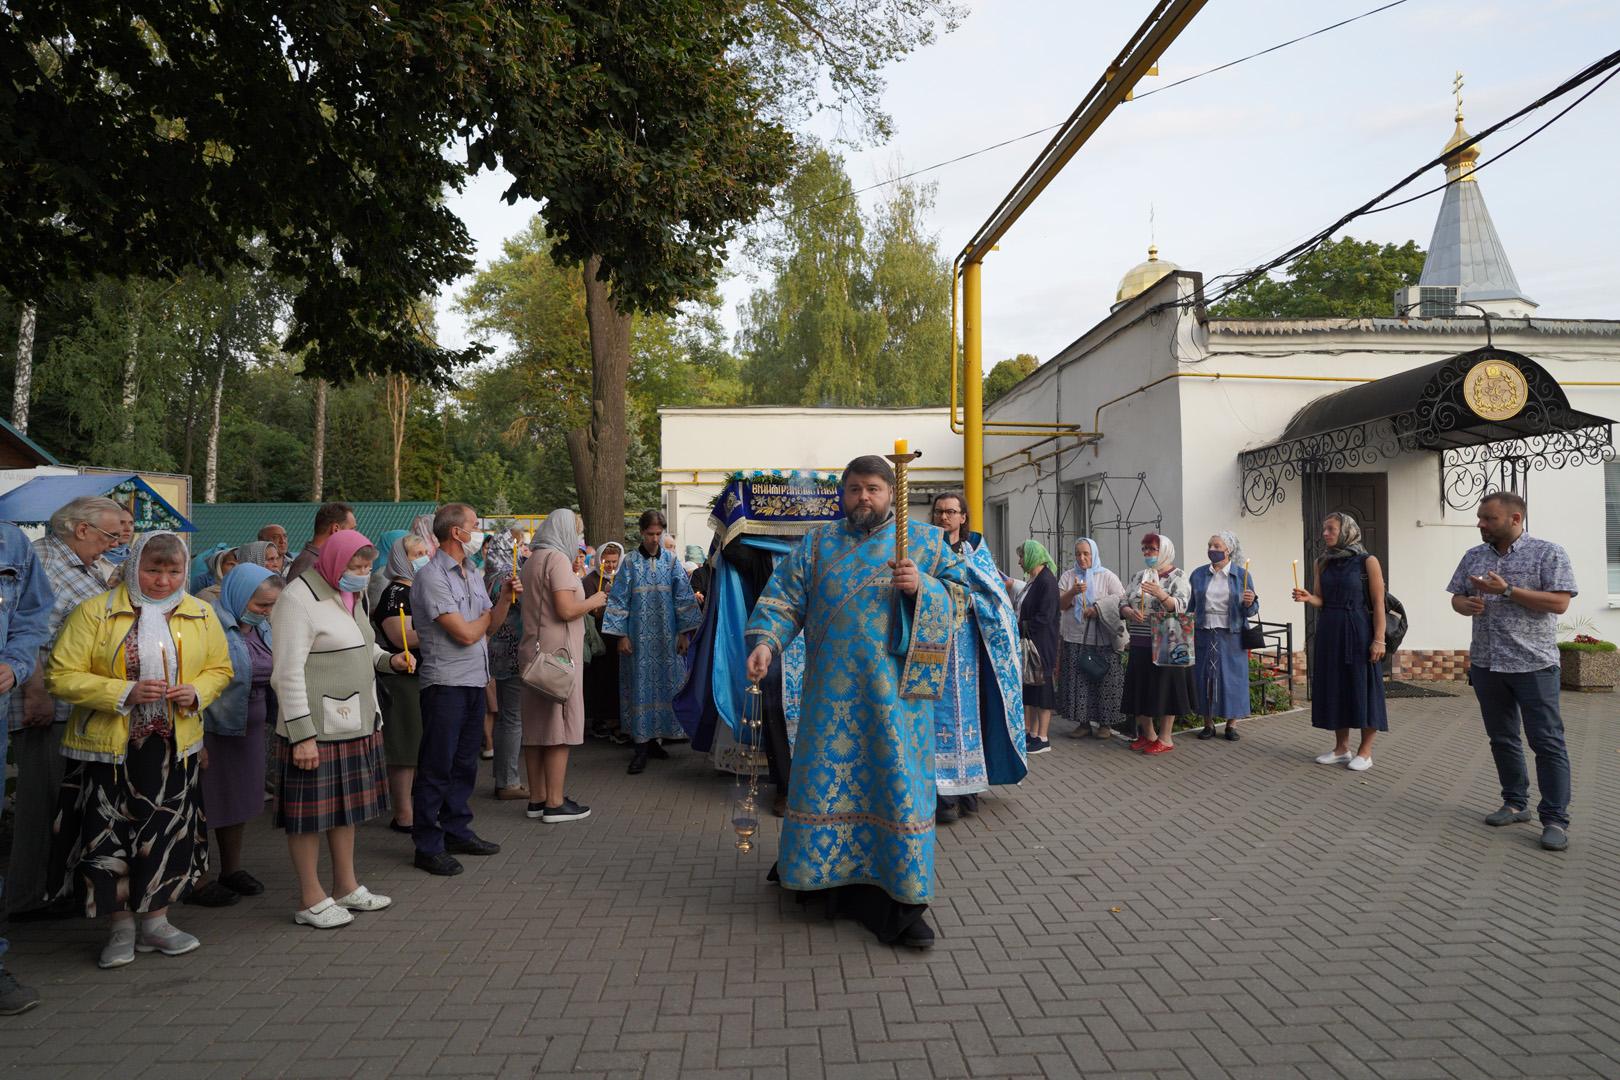 http://monuspen.ru/photoreports/eb9de00e1f5615849ea00b127bfcb98z.jpg